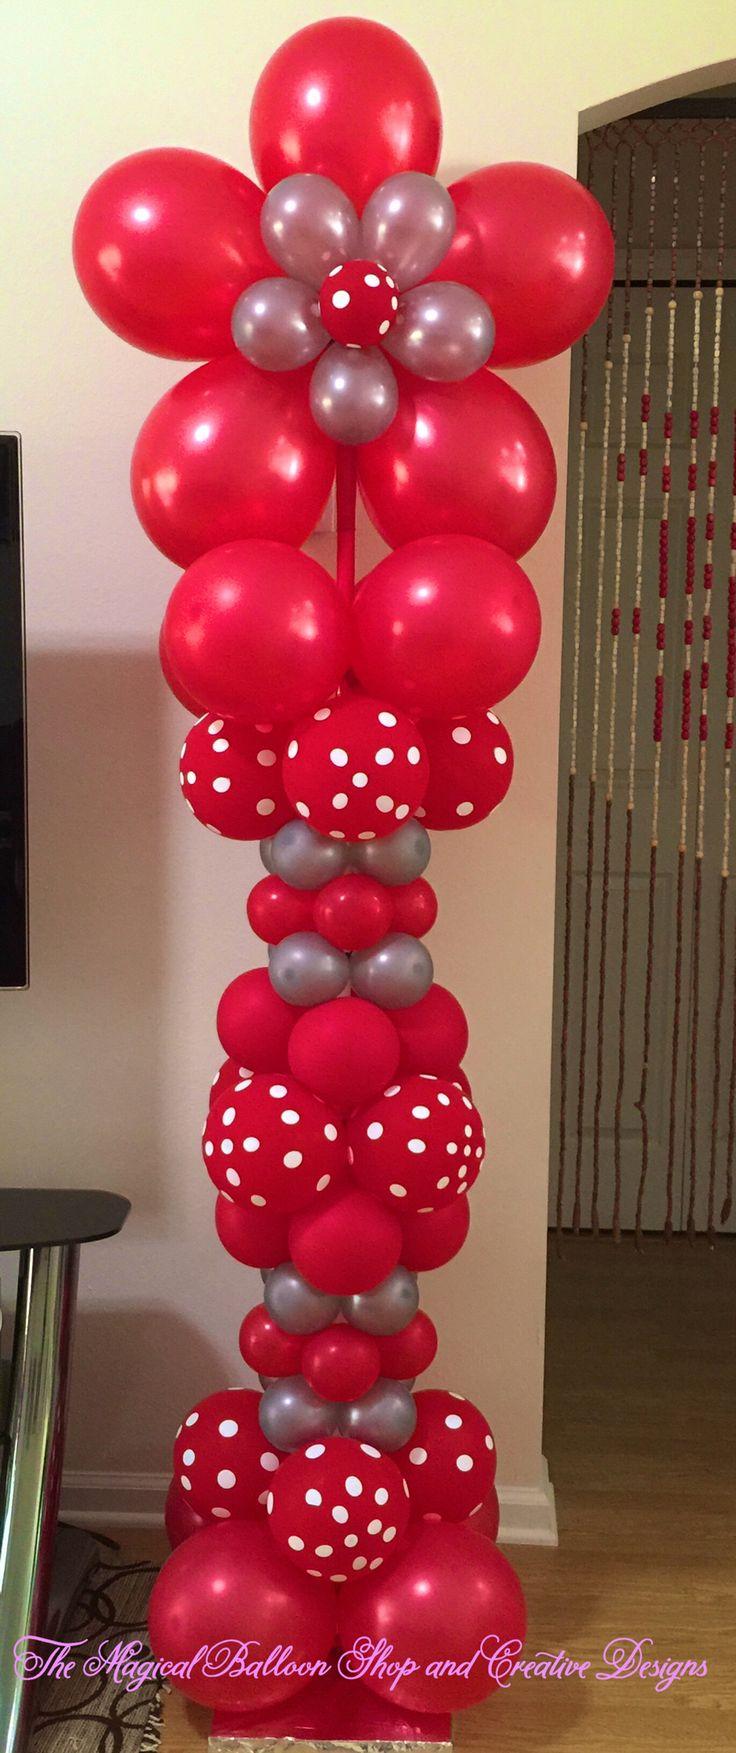 Red polka dot balloon column with flower